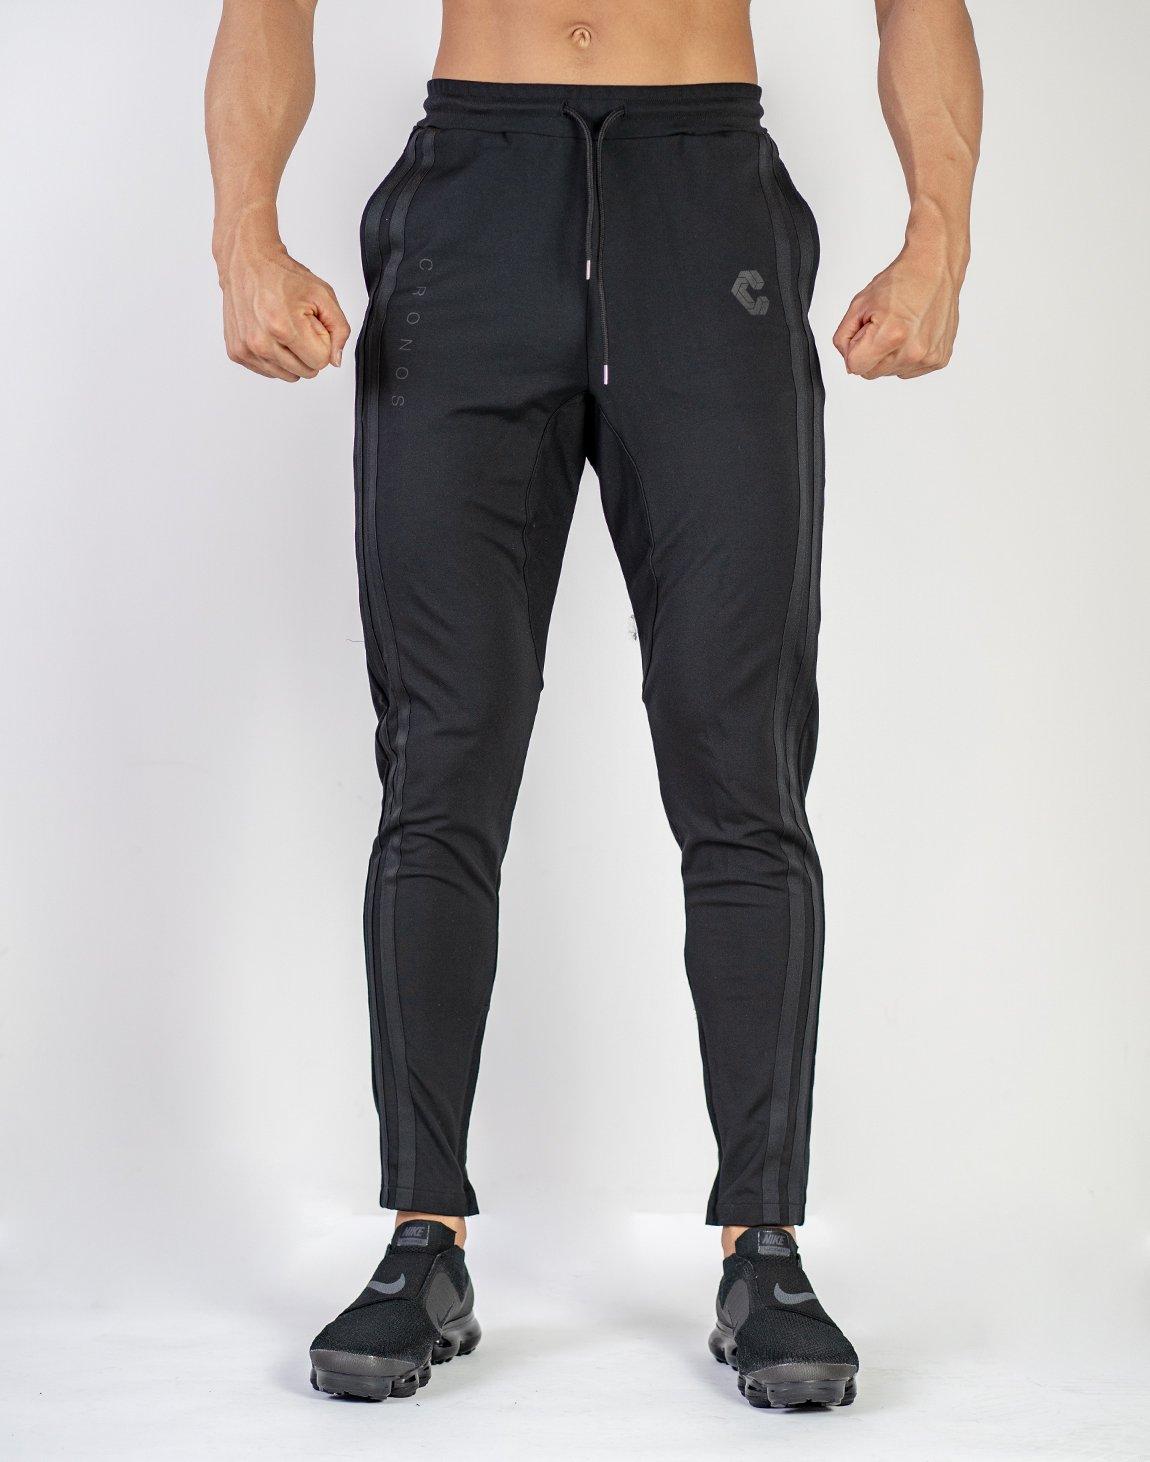 MODE  2STRIPE PANTS (SUMMER FABRIC)SP.BLACK